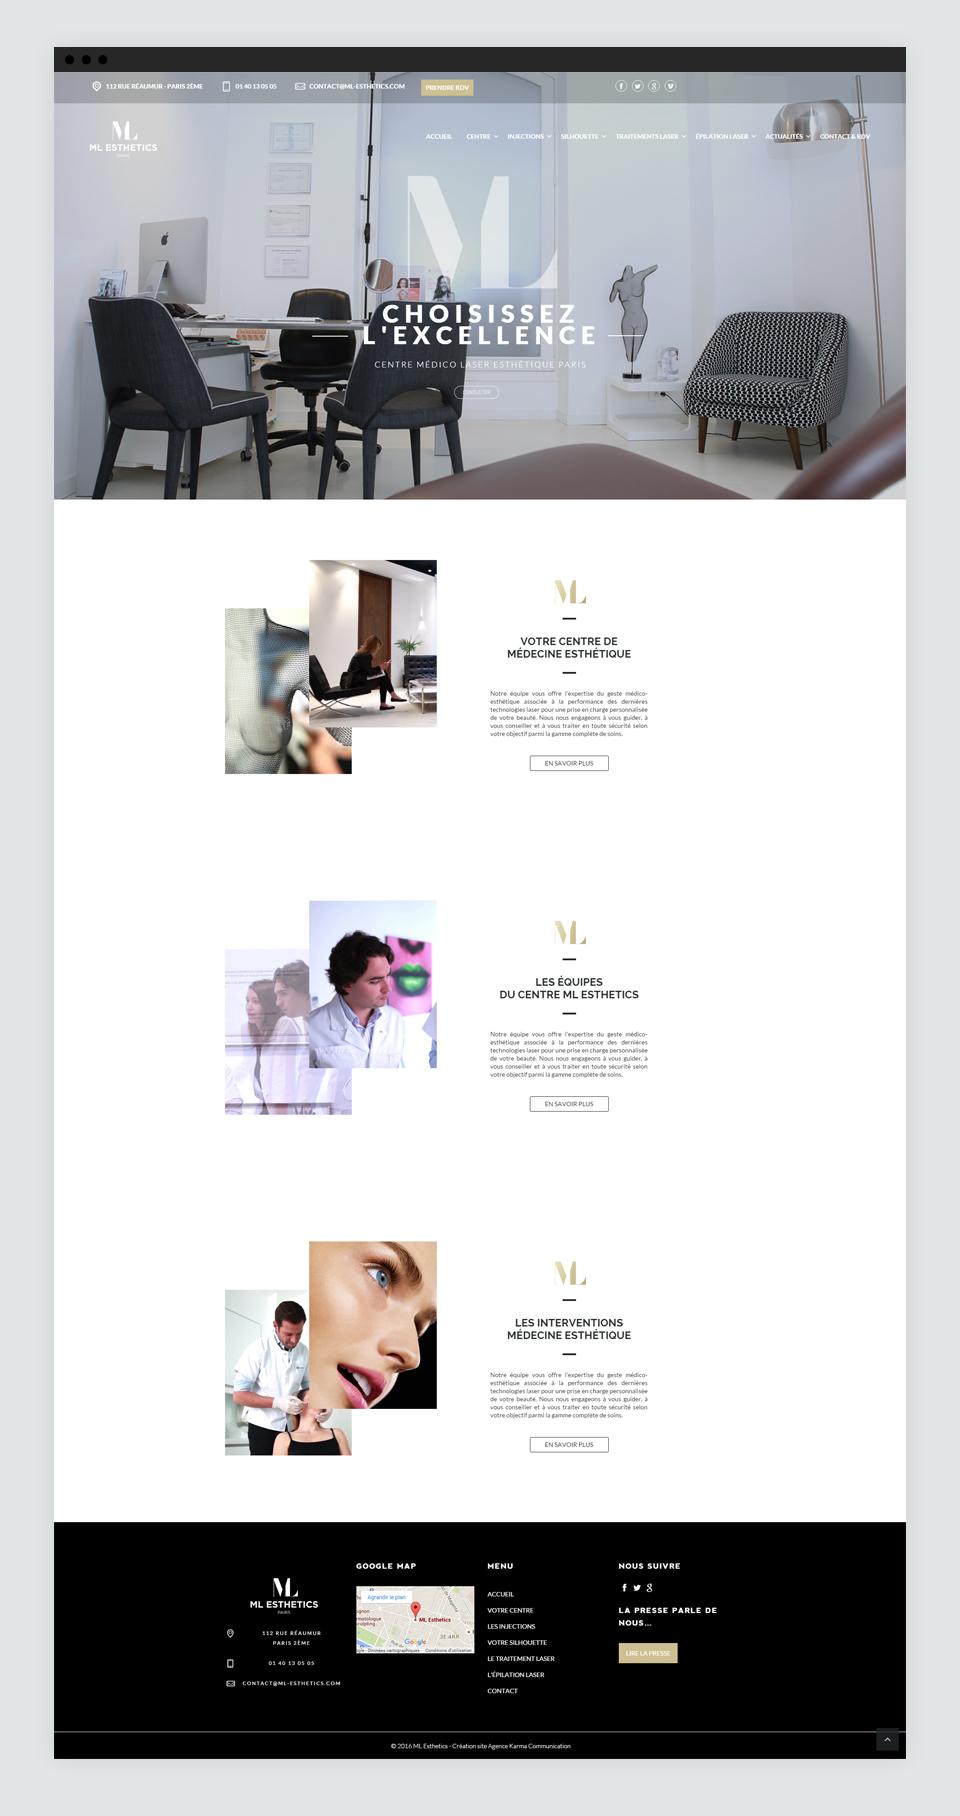 projet4-centreesthetique-jf-madignier-ux-ui-webdesign-frejus-83